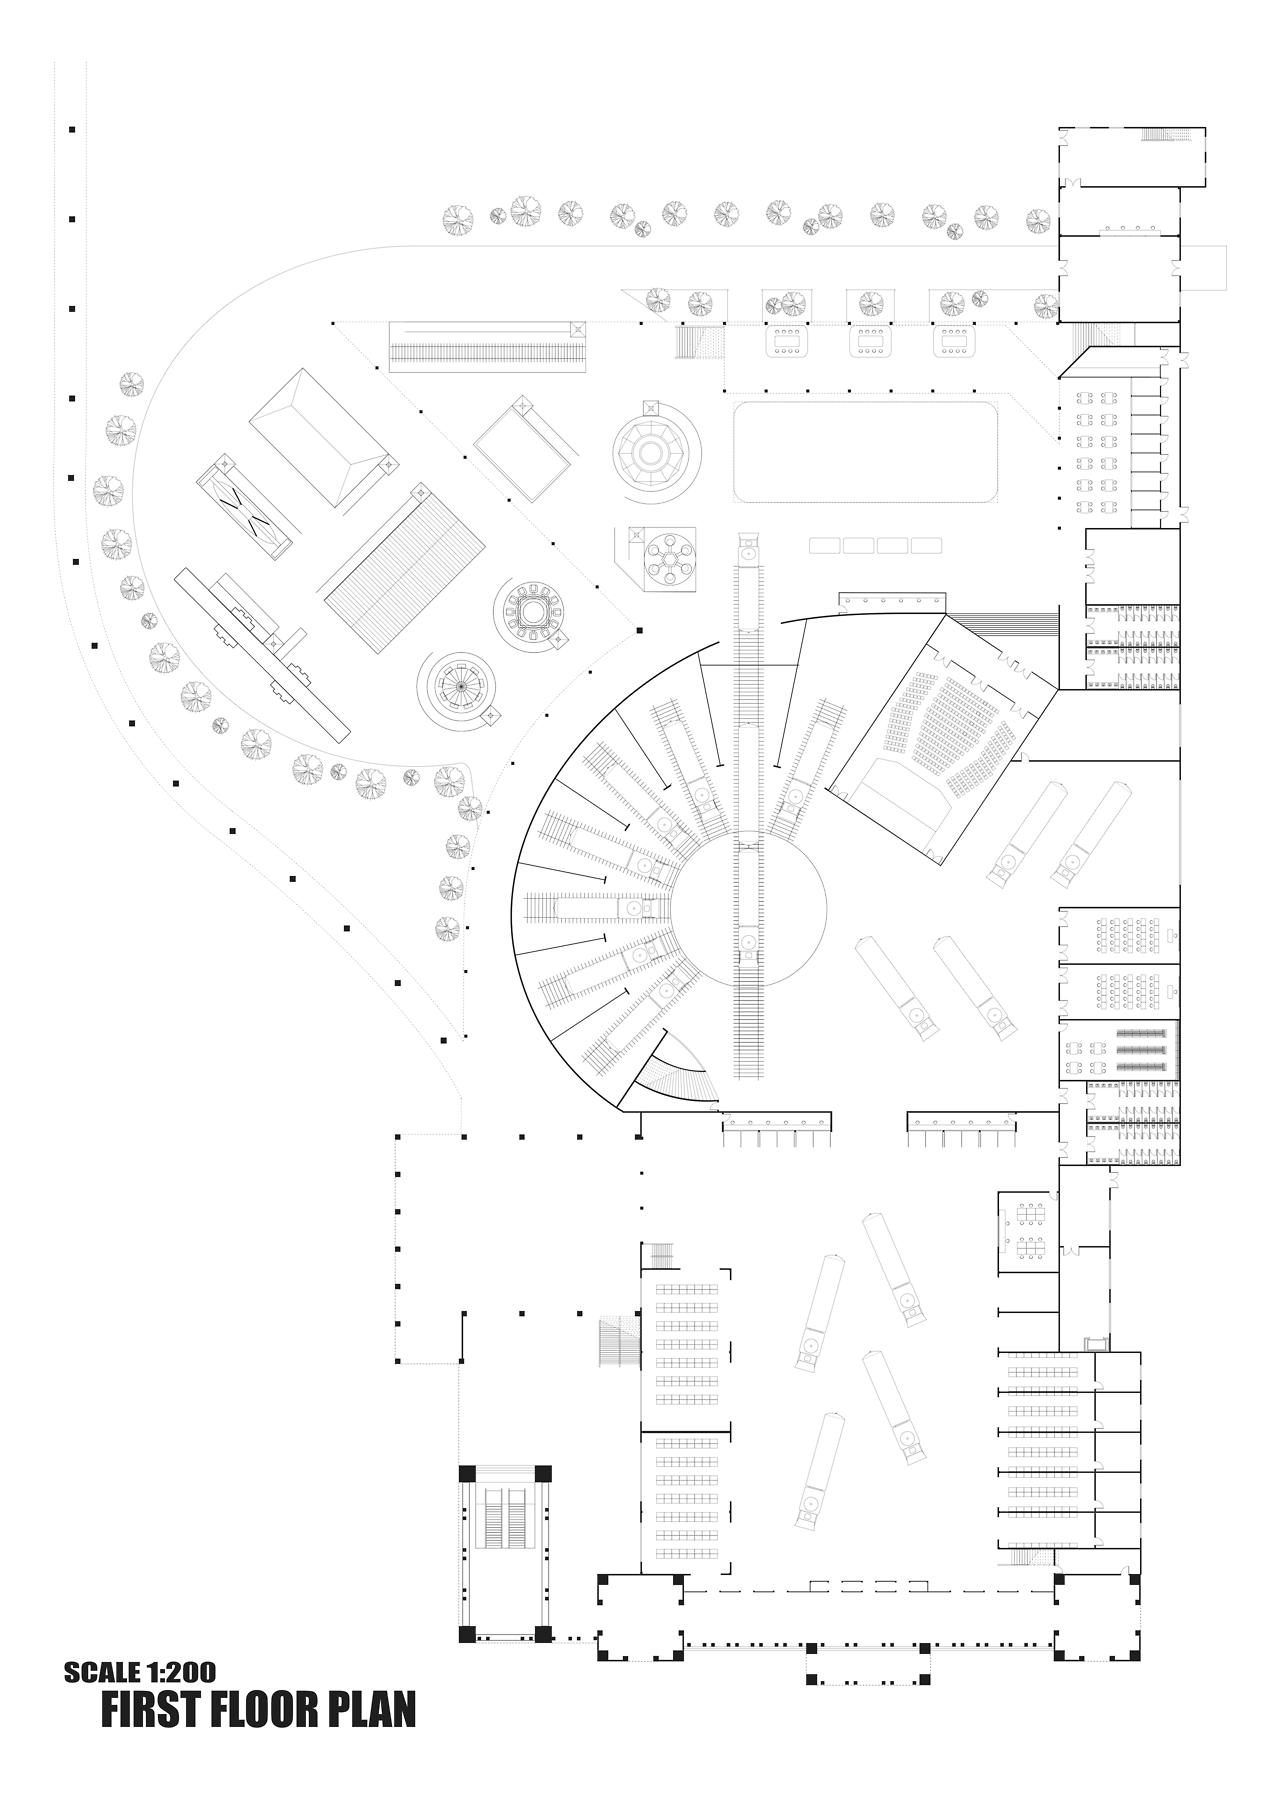 California Academy Of Sciences Floor Plan Choice Image